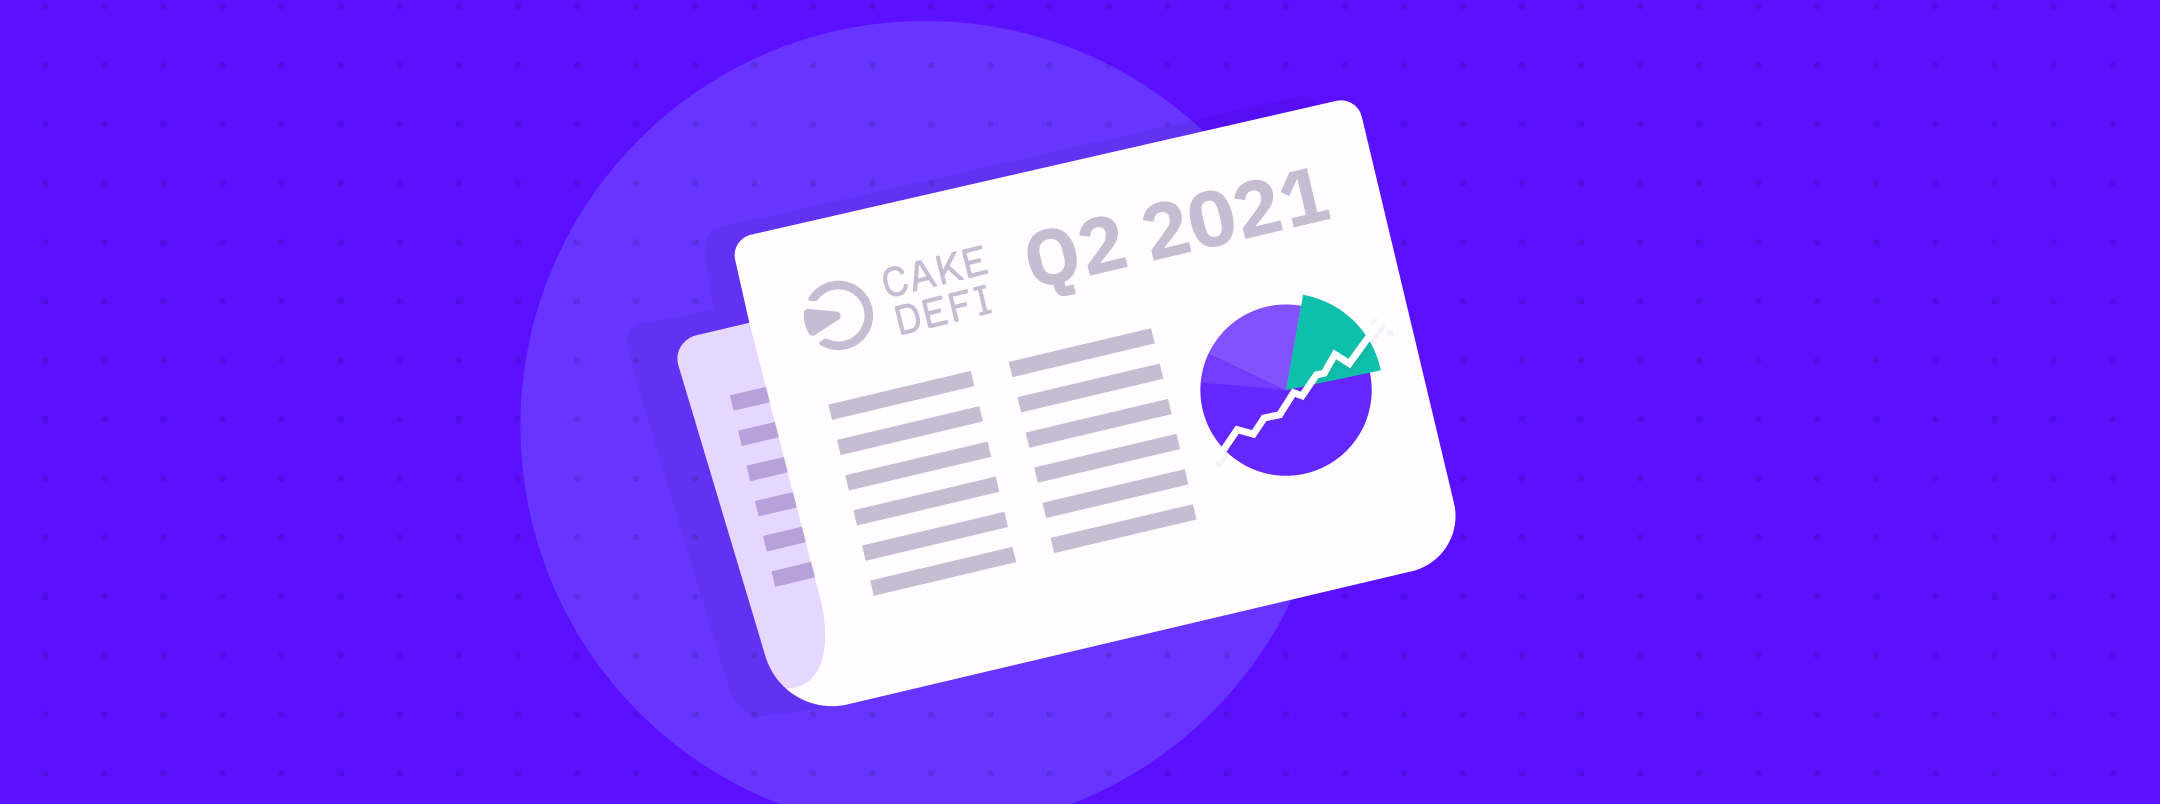 CEO Reflection Cake DeFi: Crypto Going Crazy, Cake DeFi Holding Strong